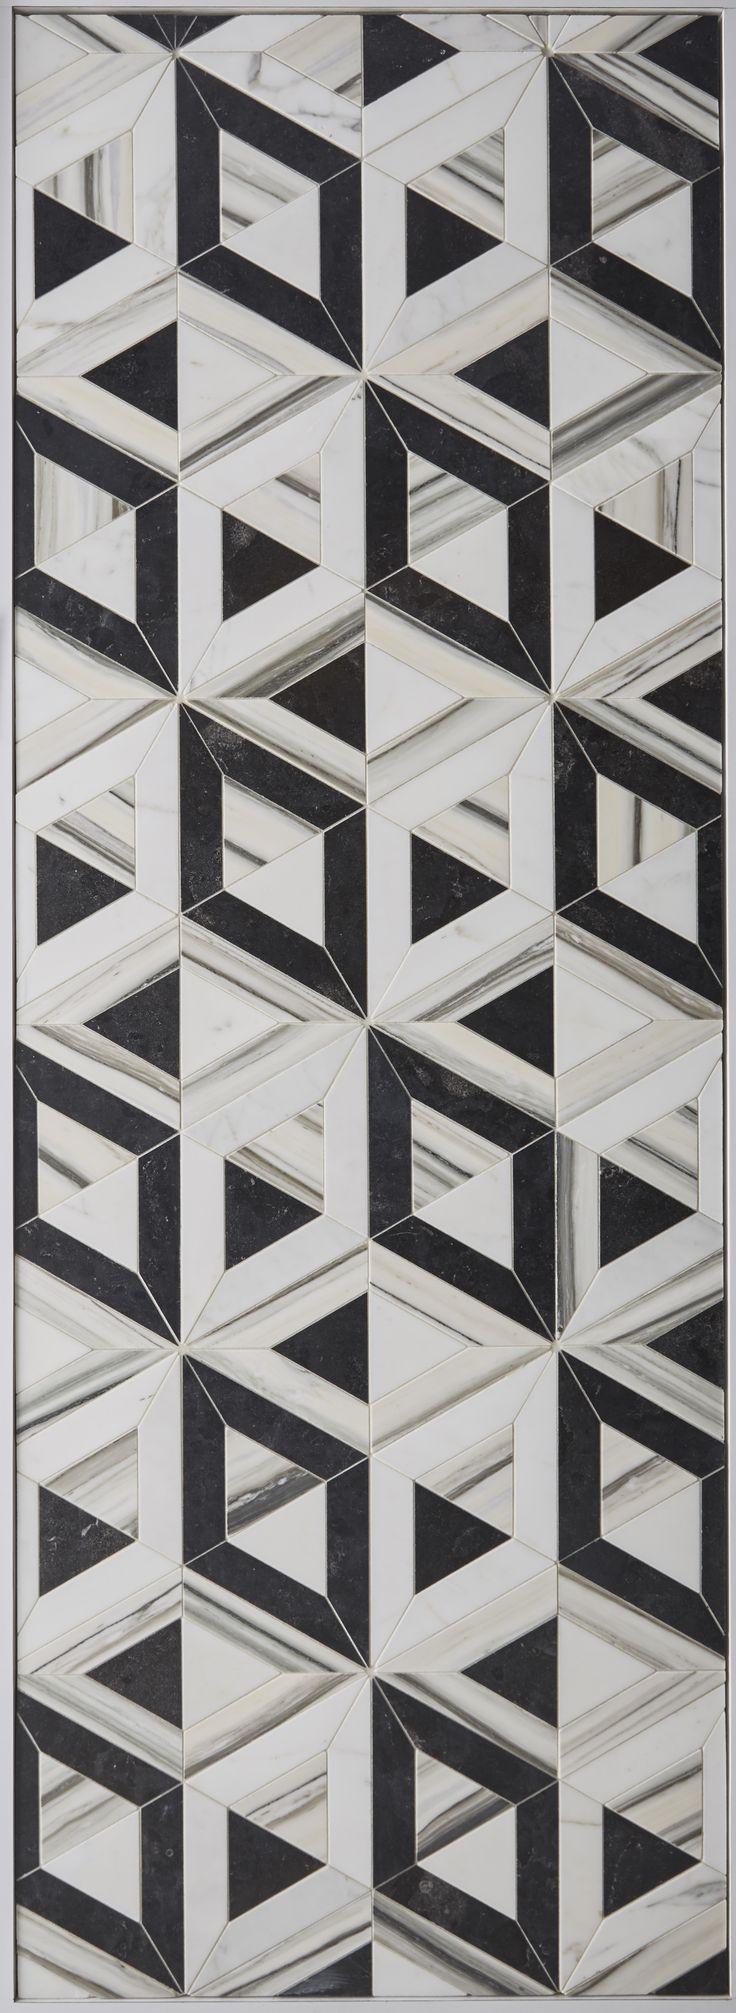 Floor tile pattern design